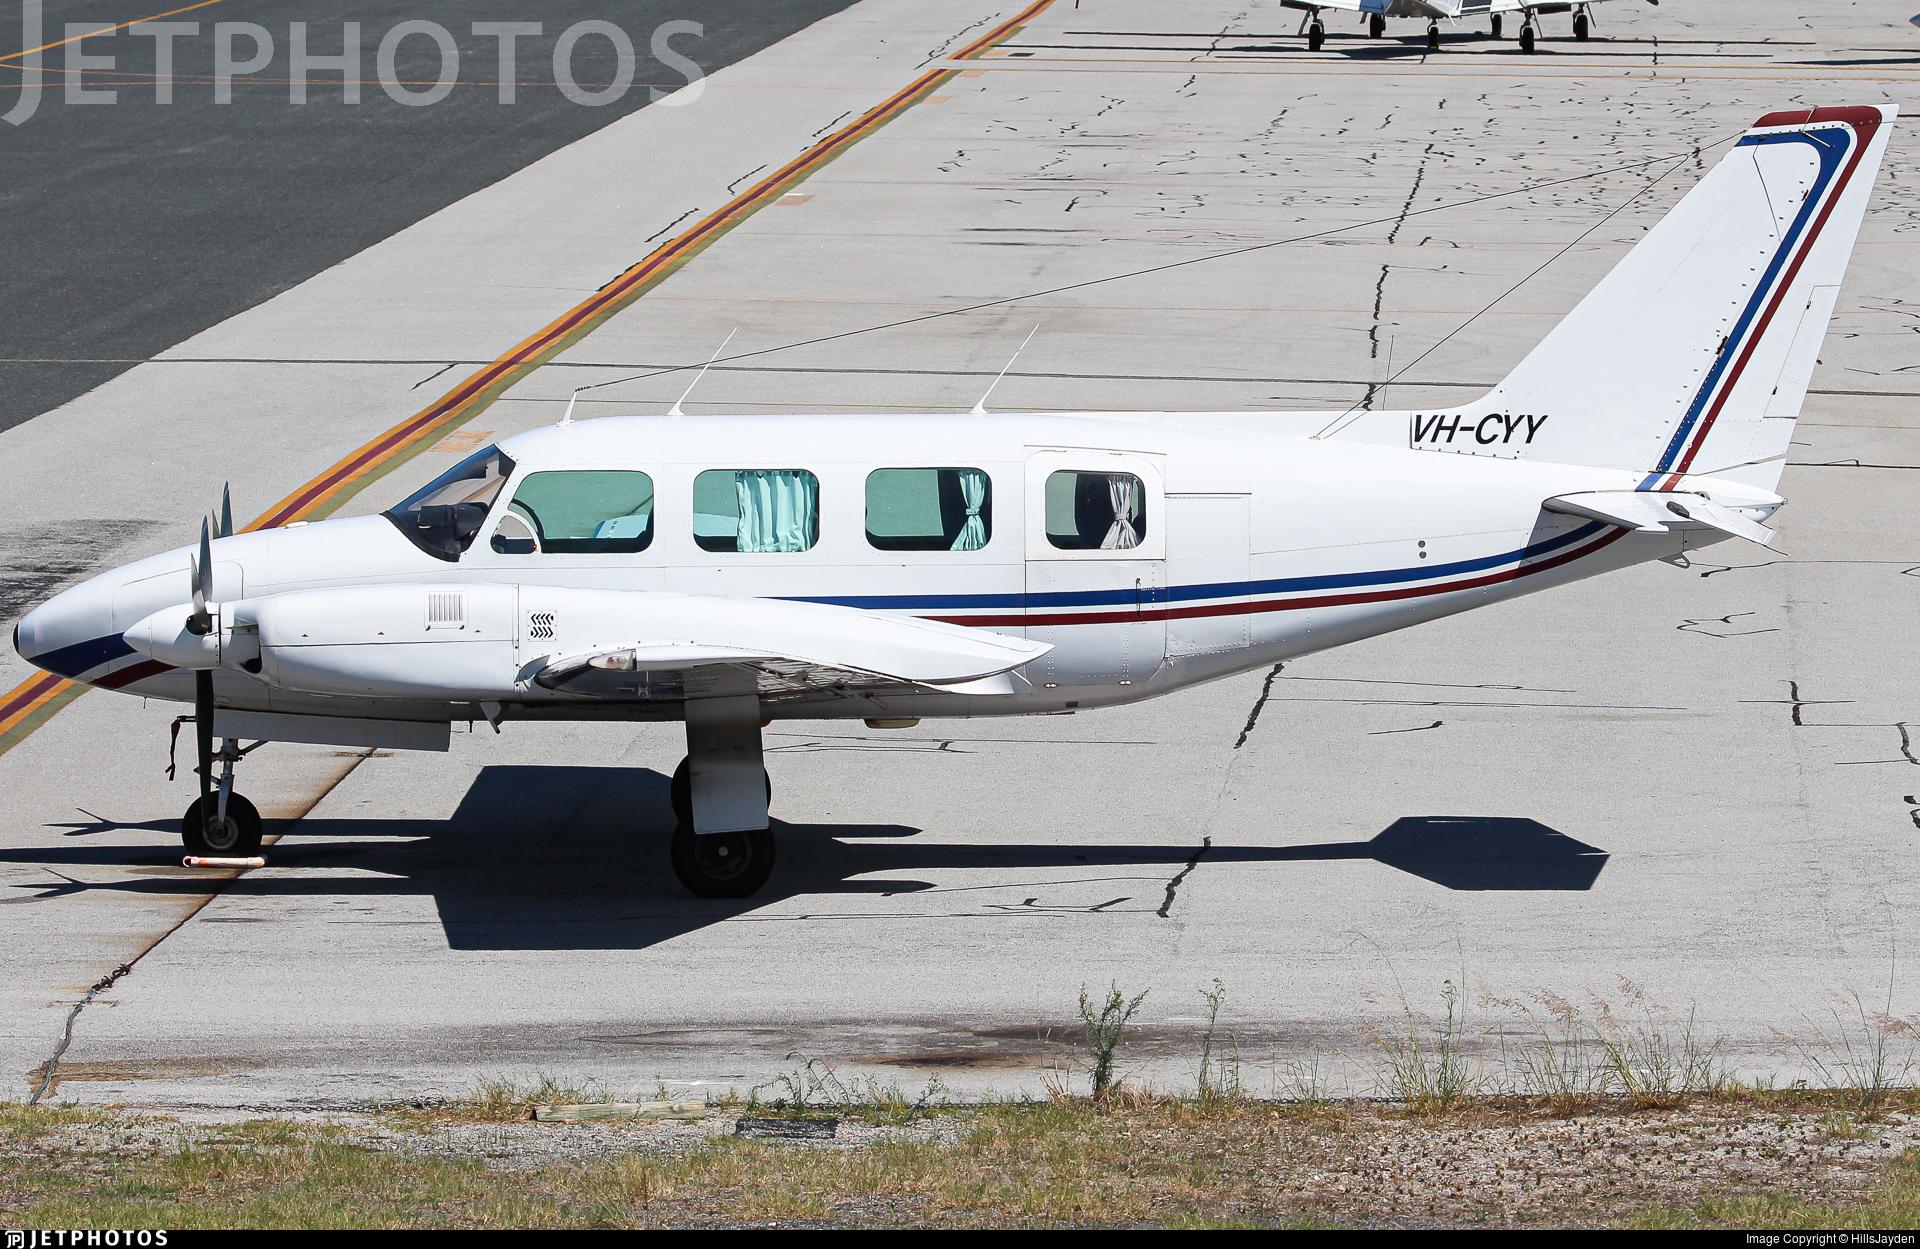 VH-CYY - Piper PA-31-310 Navajo B - Private